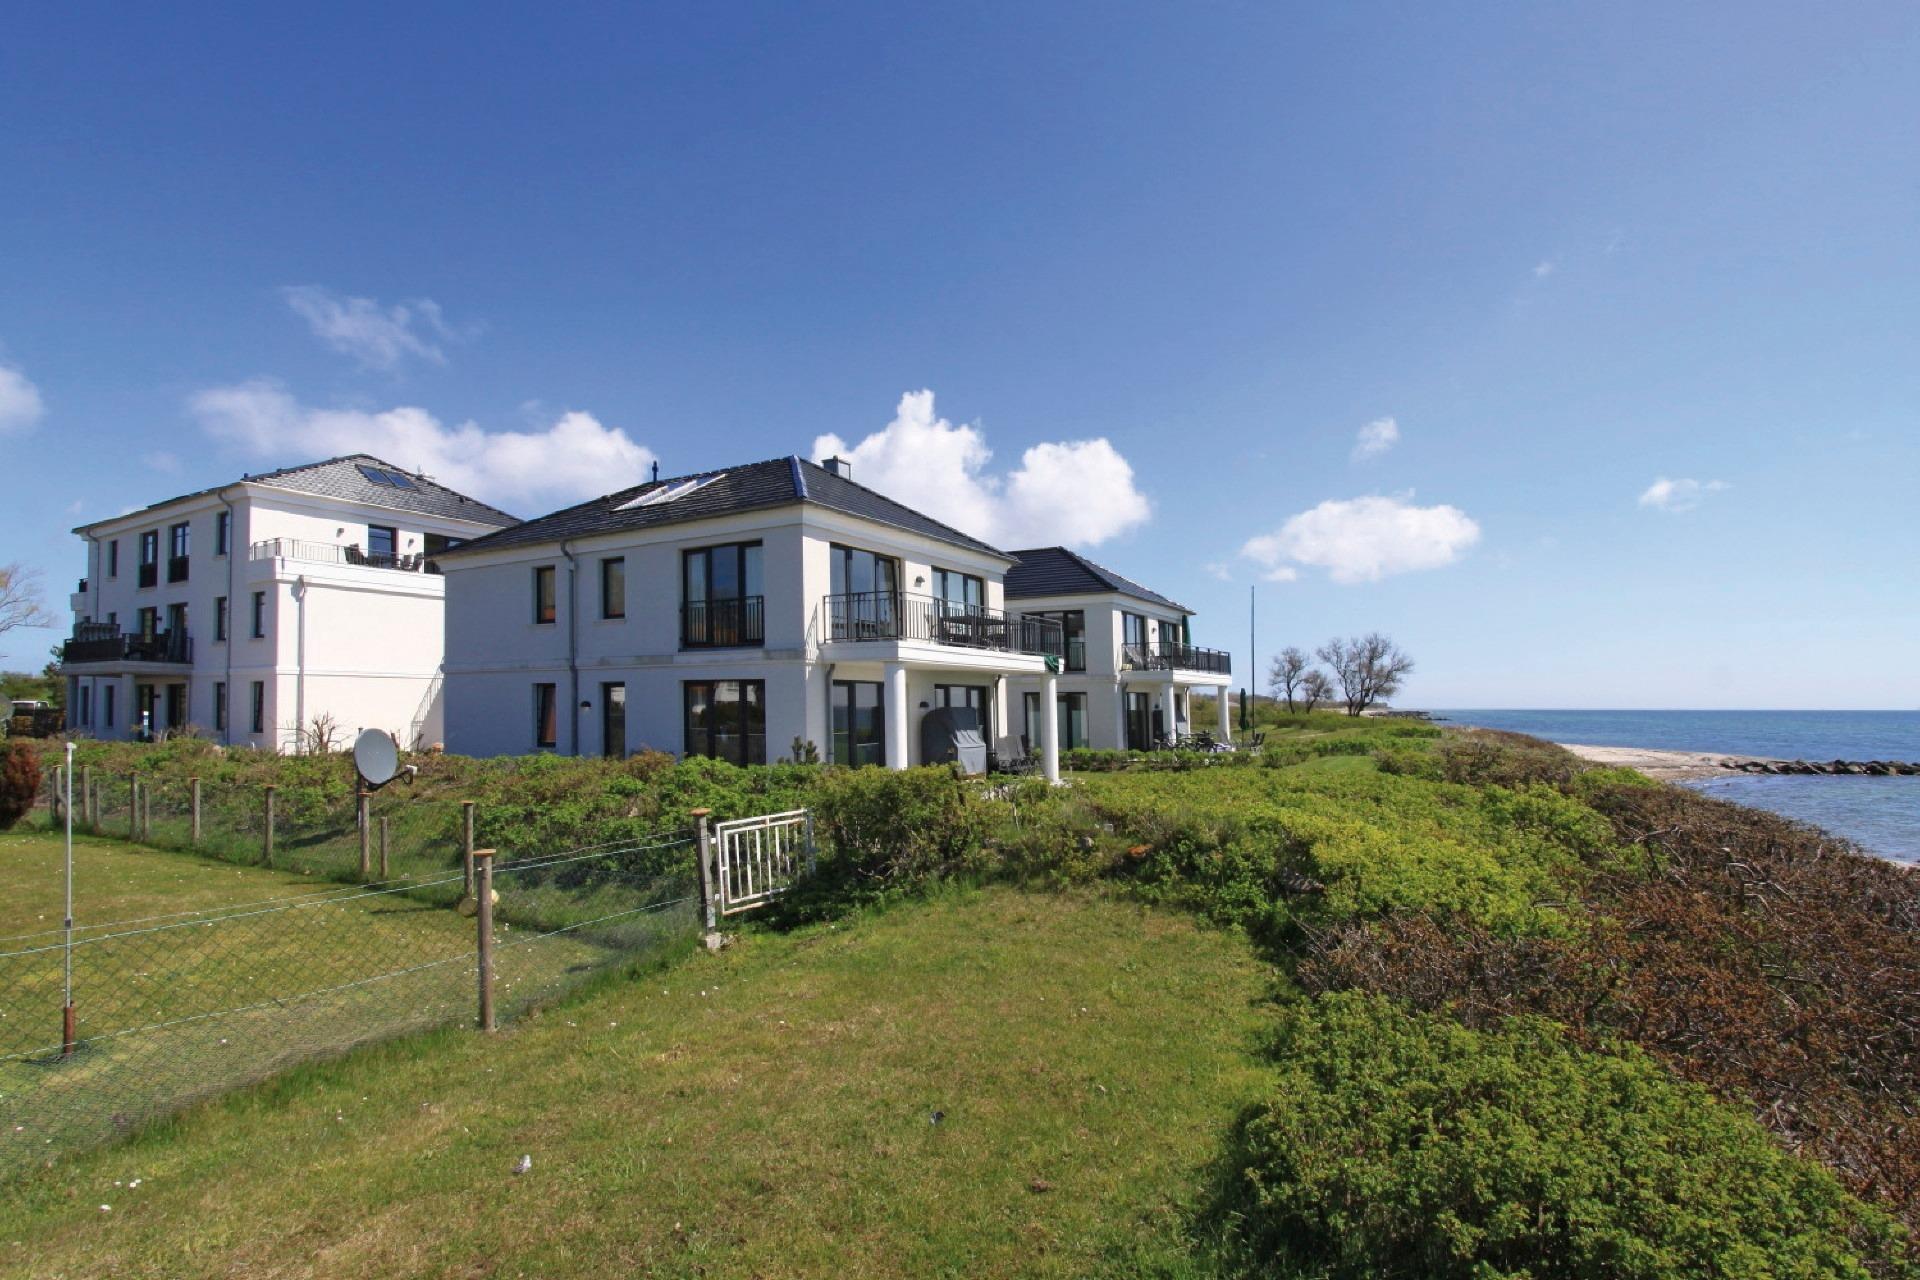 Strandresidenz Vogelflug Haus Ostseeblick App 13 9150